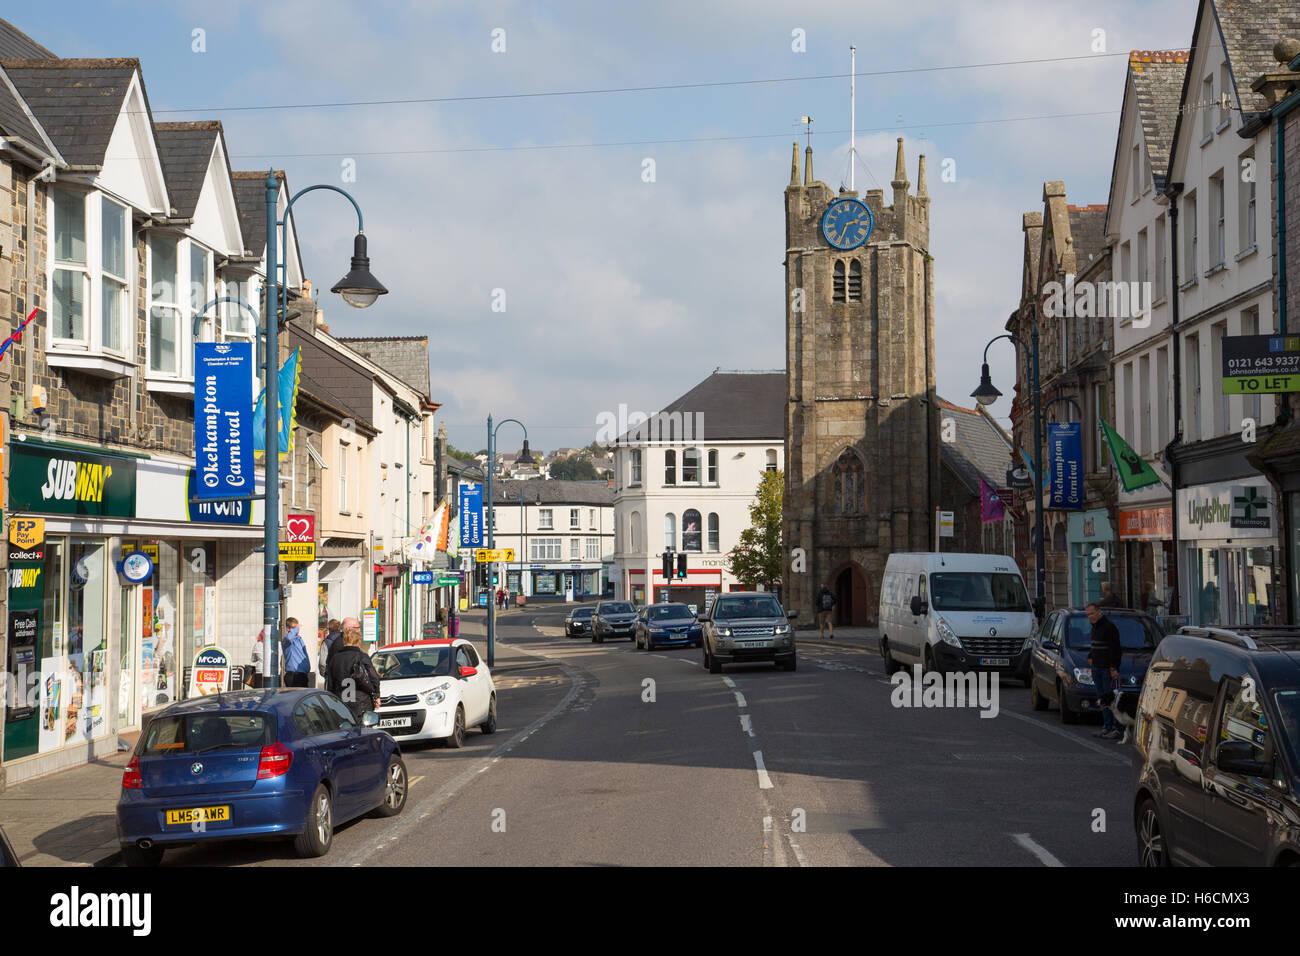 Fore Street, Okehampton - Stock Image